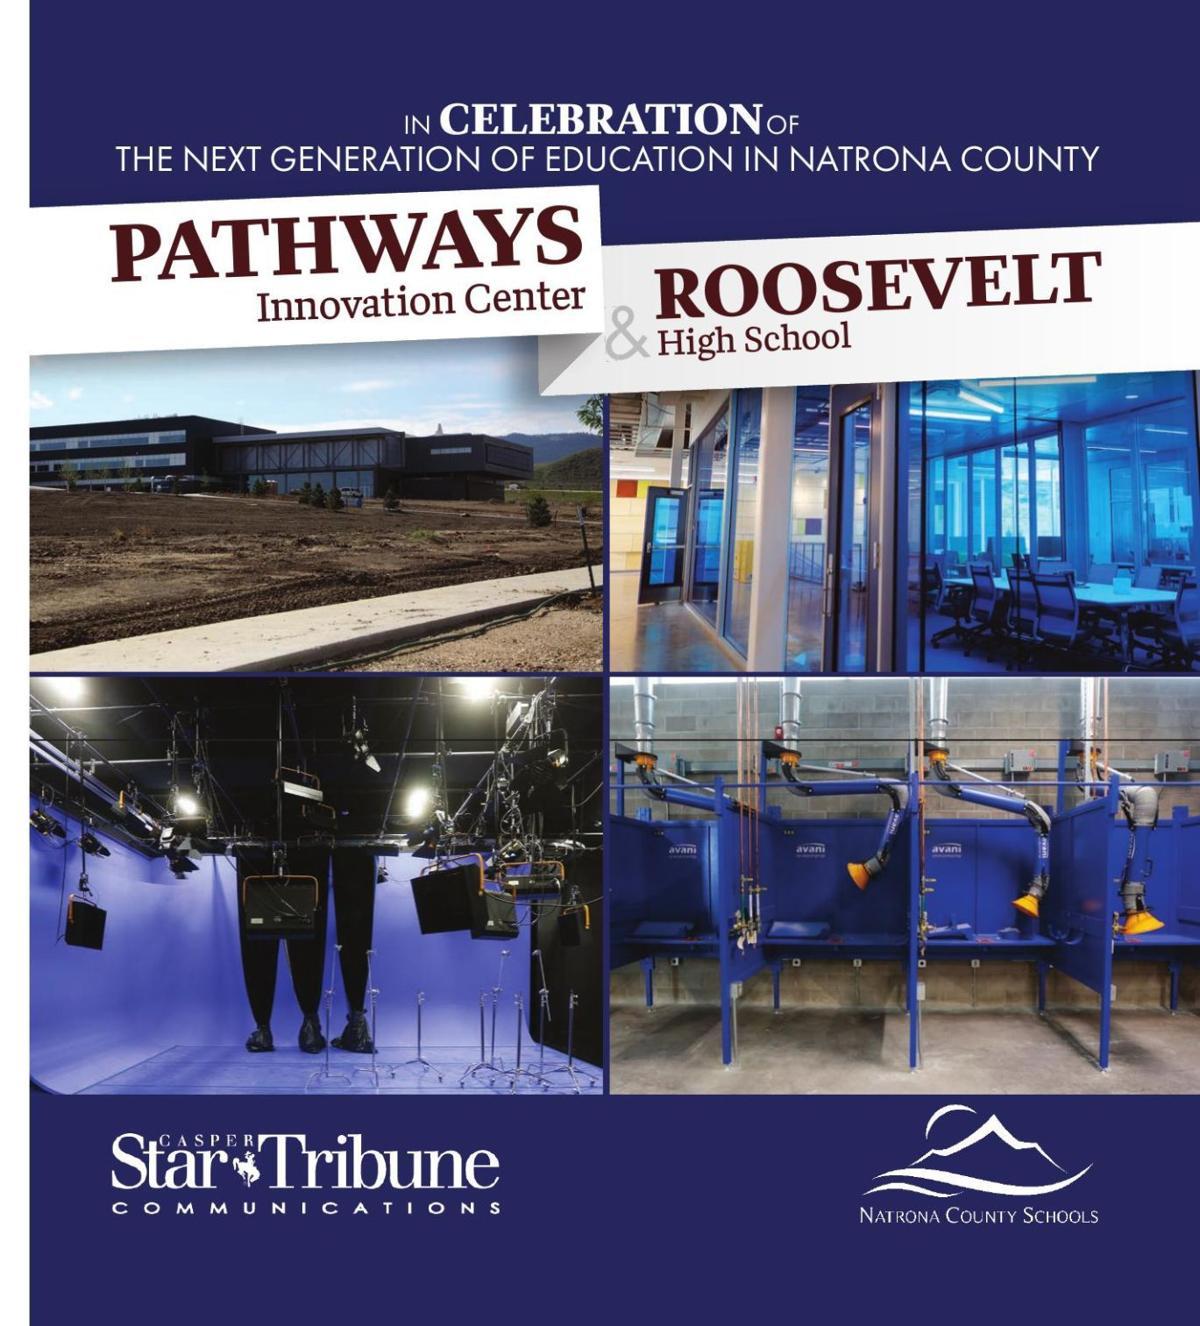 Celebrations: Pathways Innovation Center and Roosevelt High School